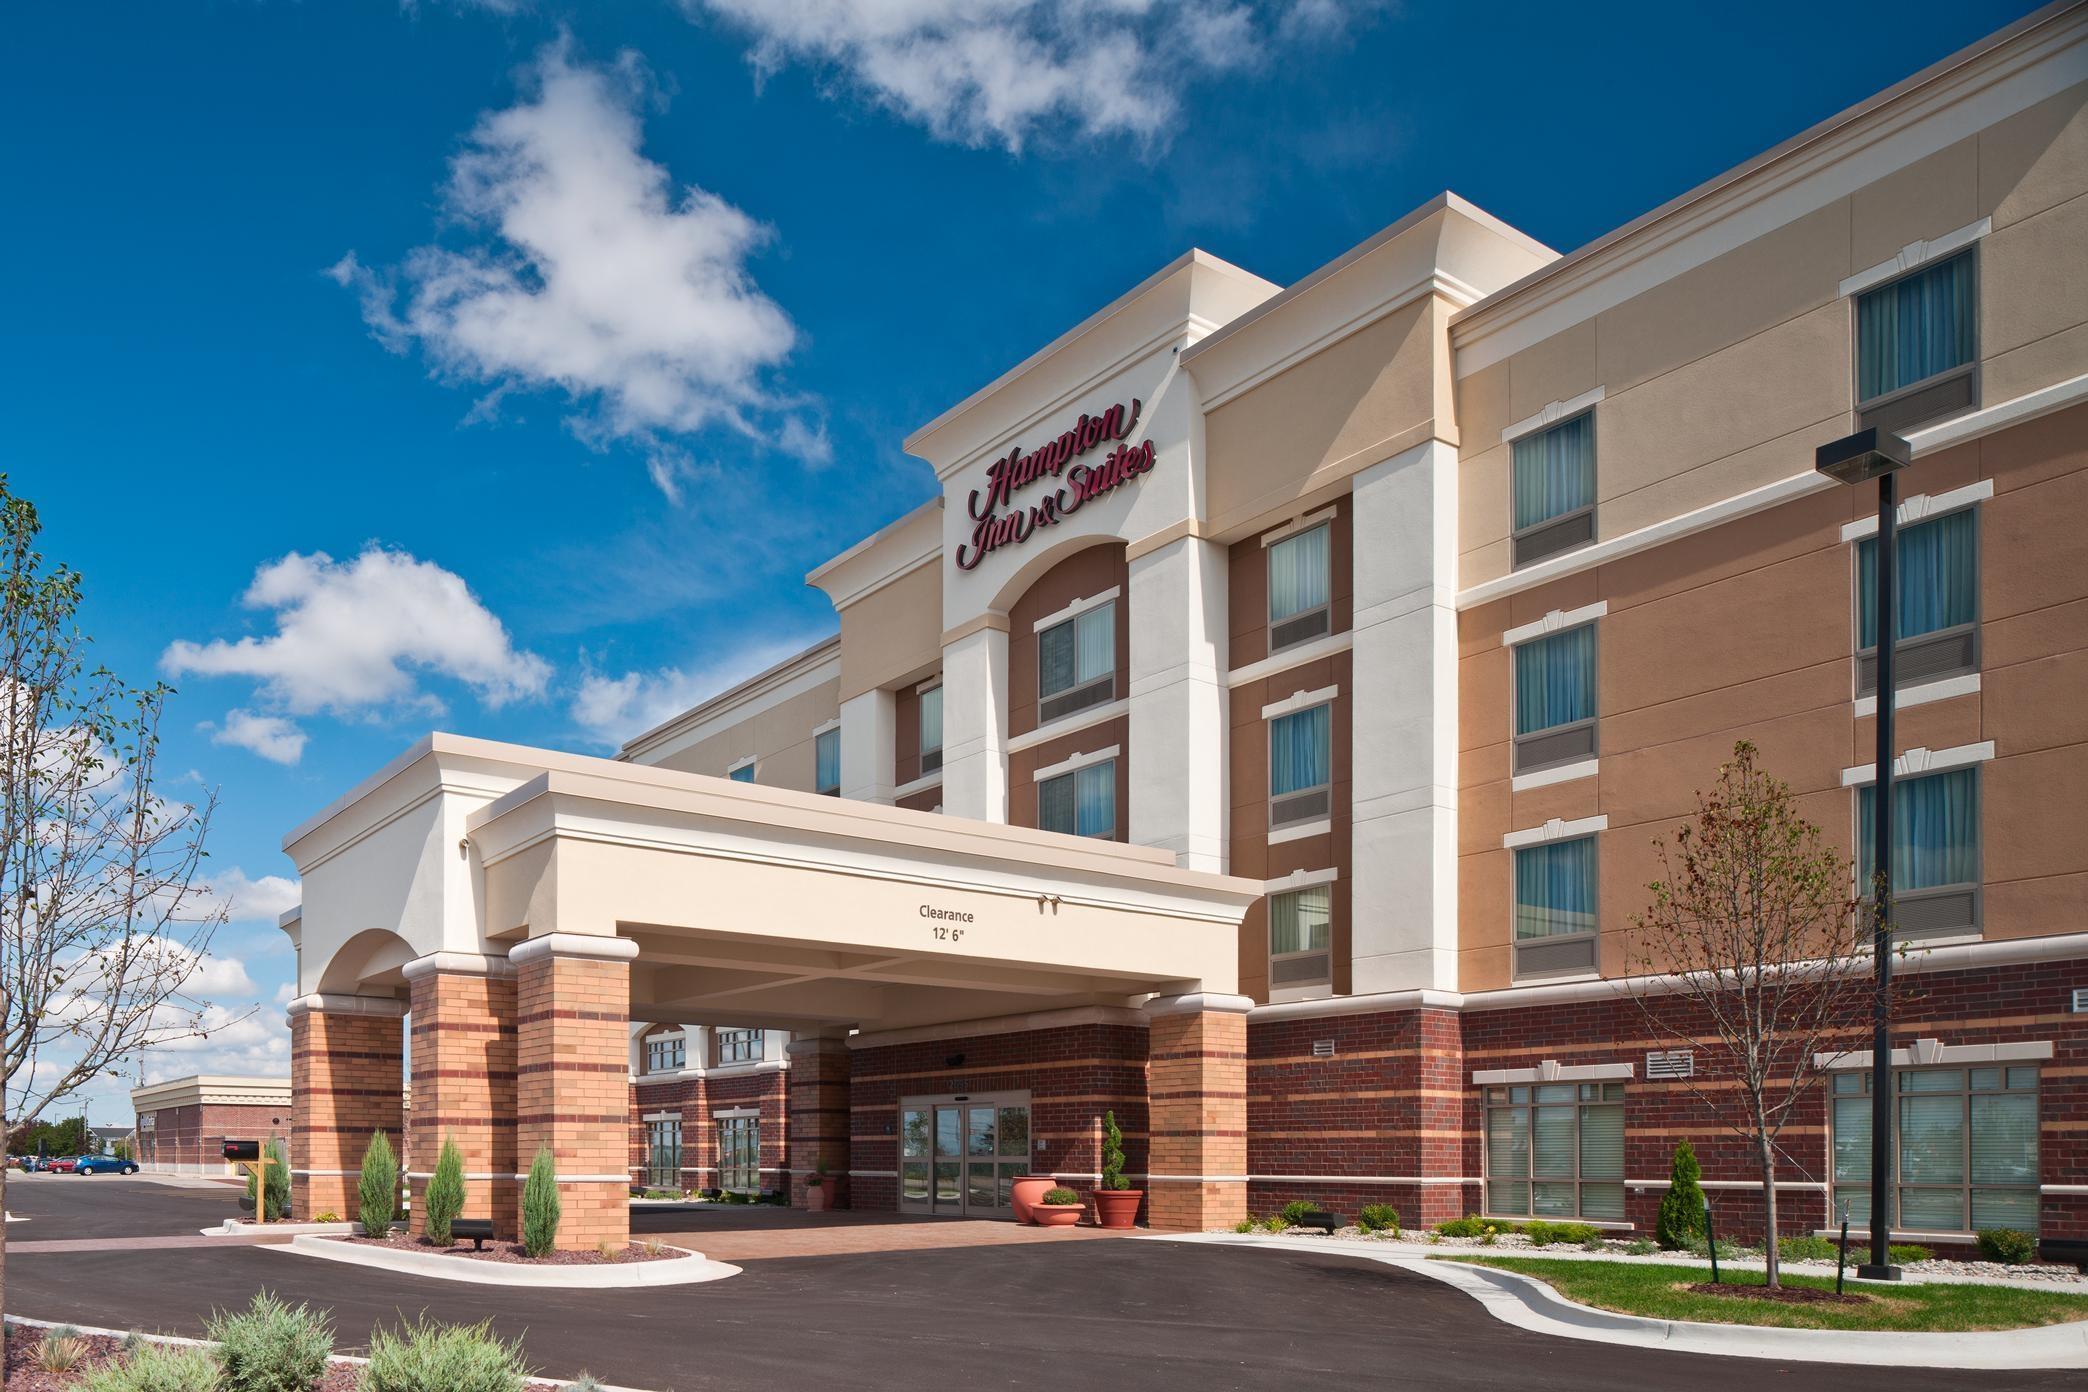 Hampton Inn & Suites Saginaw image 1